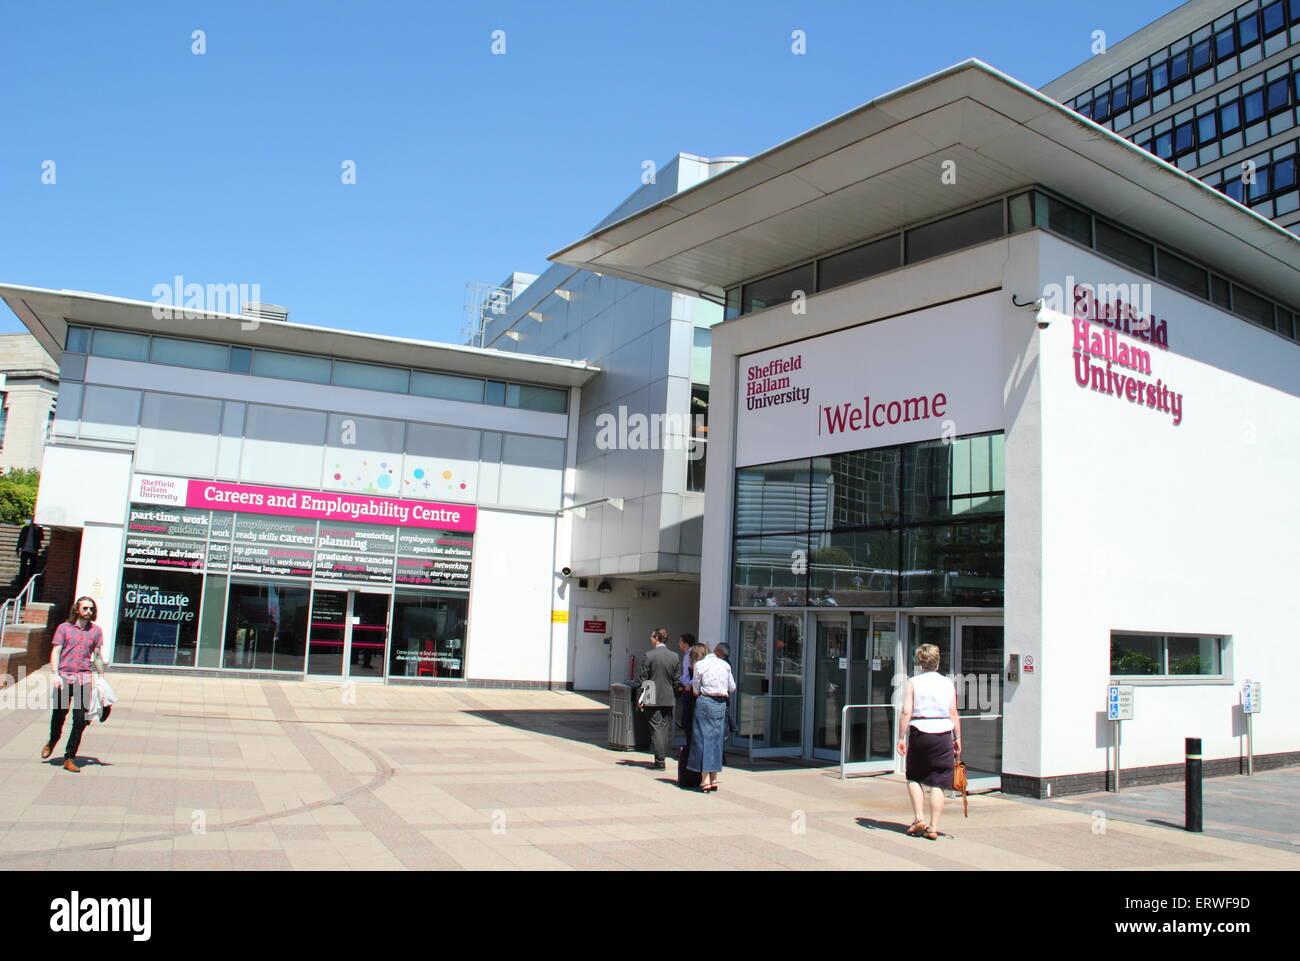 The entrance to Sheffield Hallam University, Howard Street campus, Sheffield, UK looking to the Careers & Employability Stock Photo